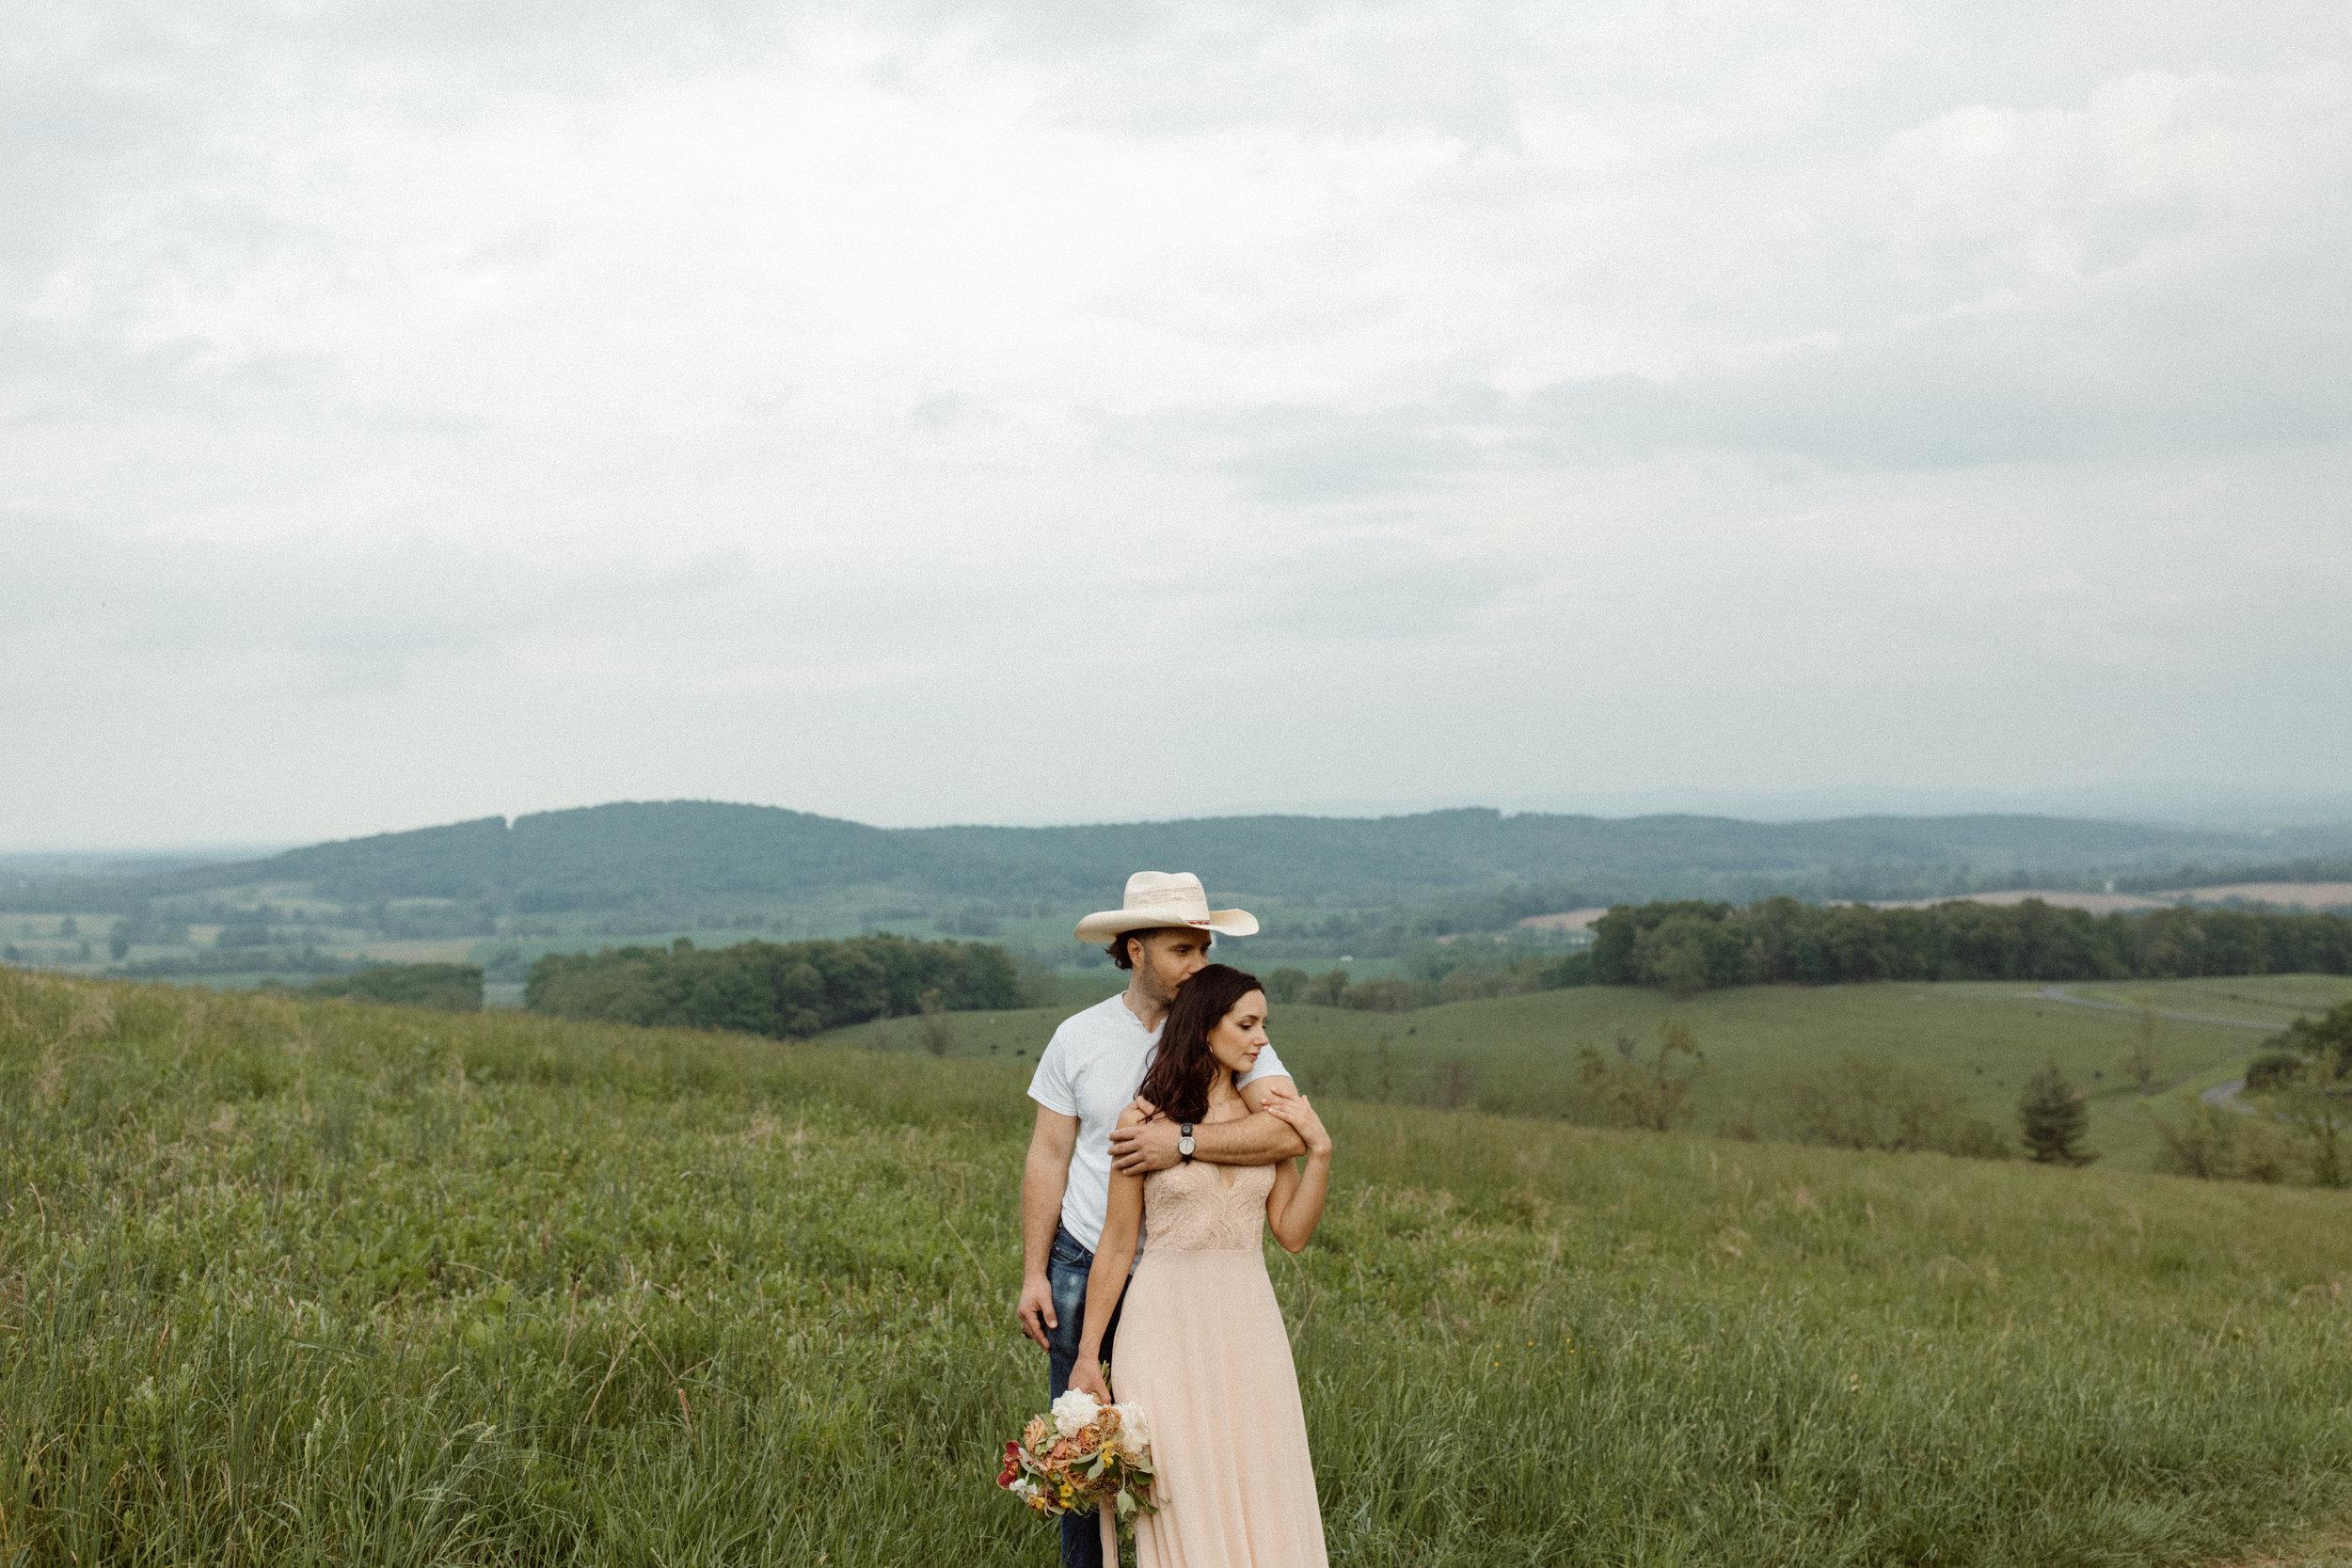 kelsey&mark-engagement-skymeadows-2019-peytoncurry-9324.jpg